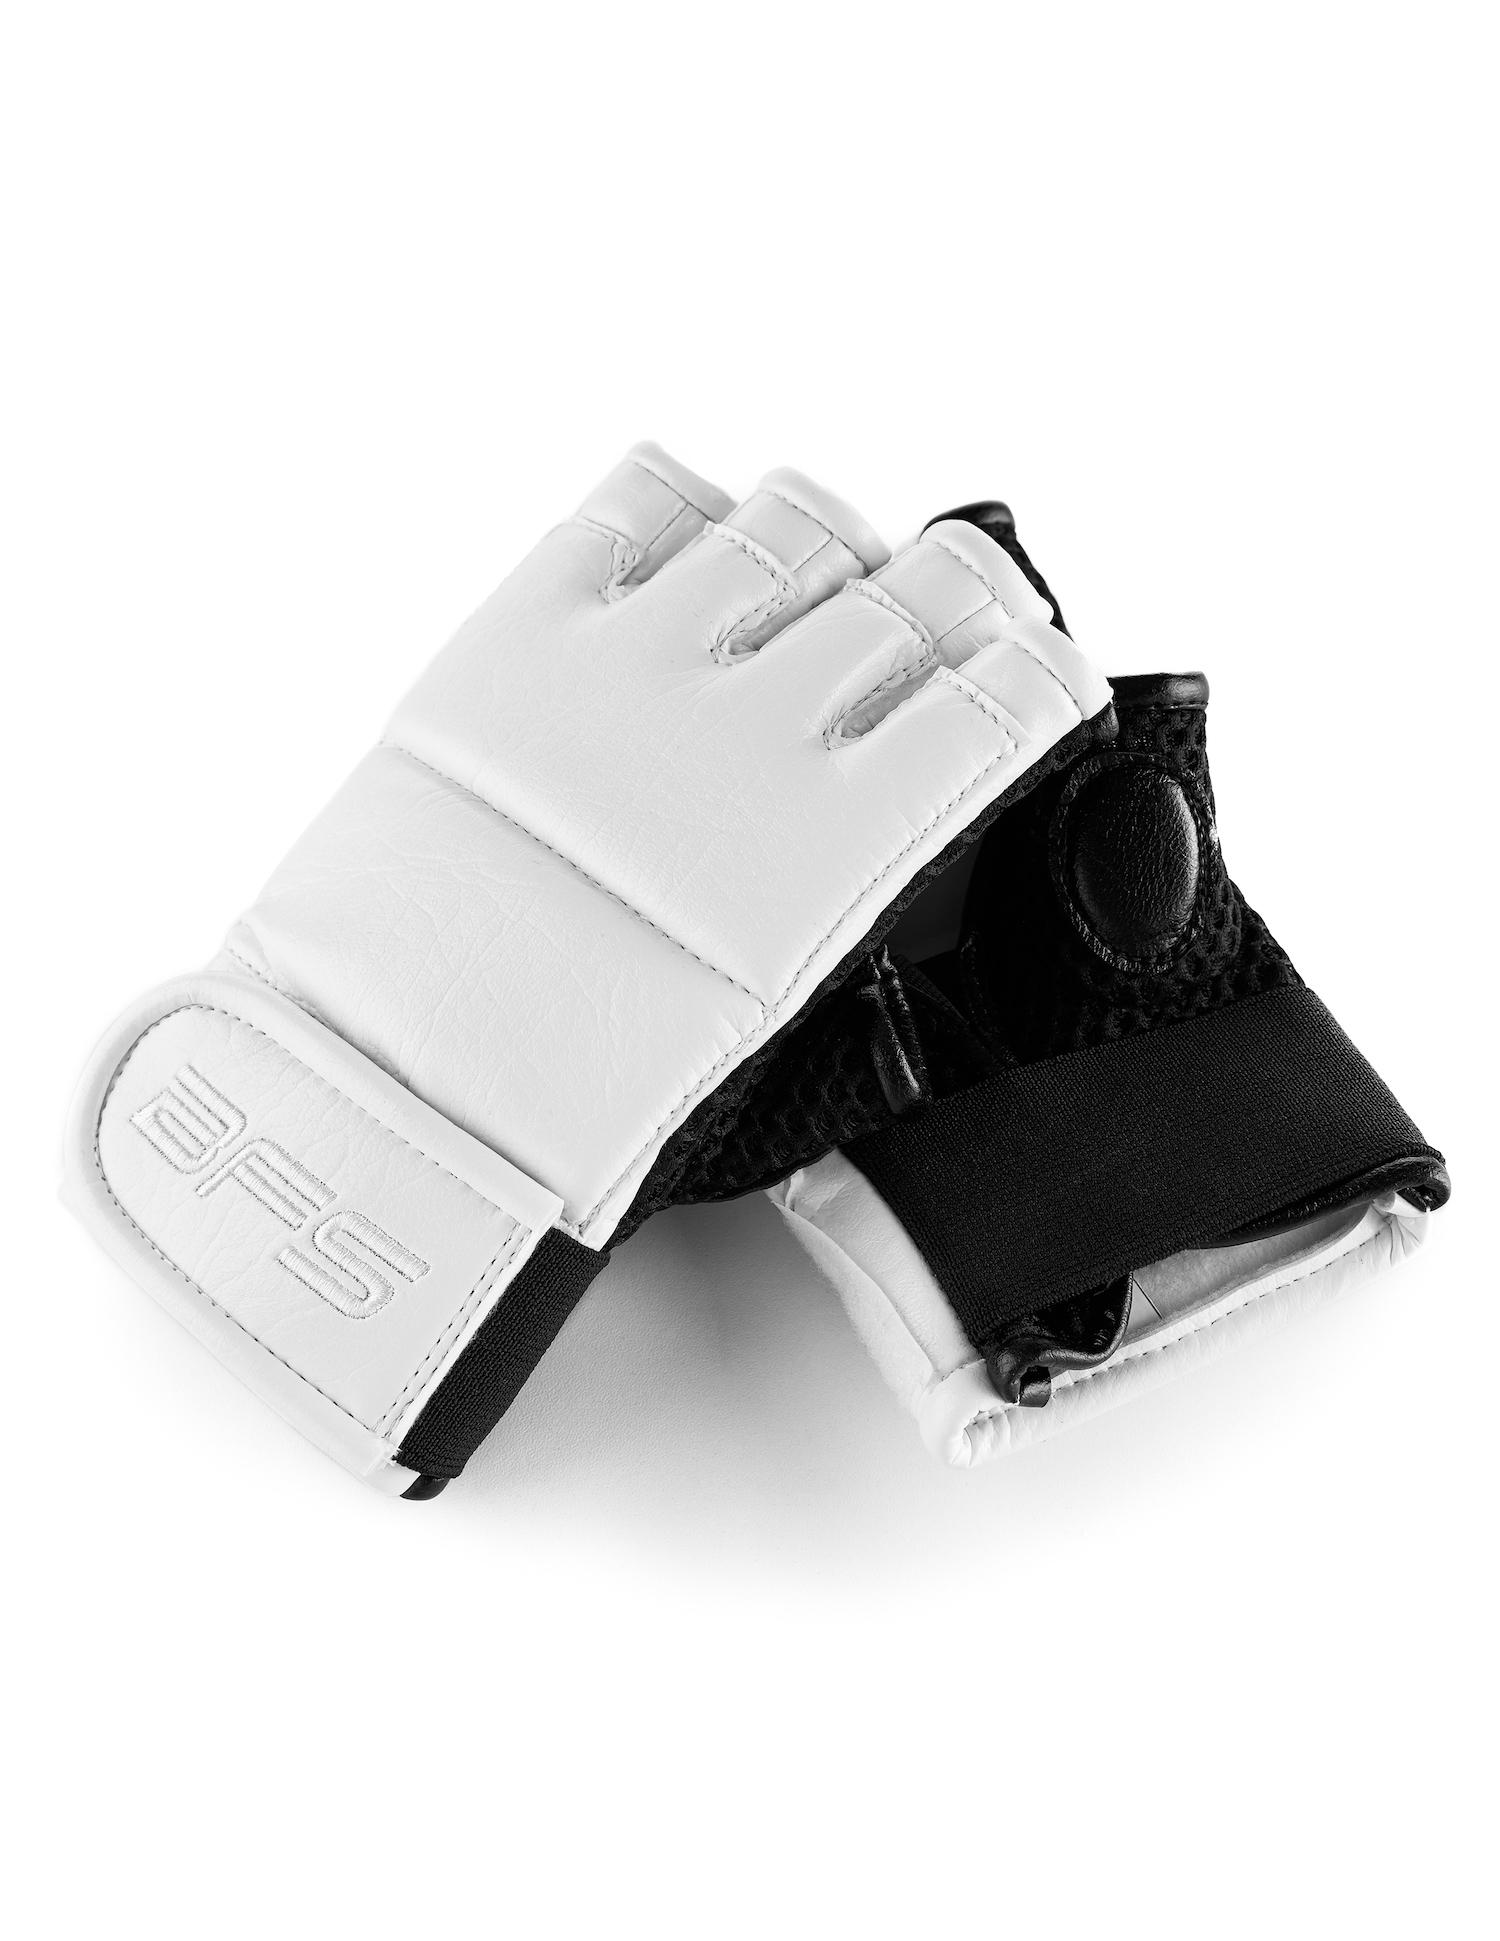 Перчатки Перчатки BFS / Medium 12.jpg